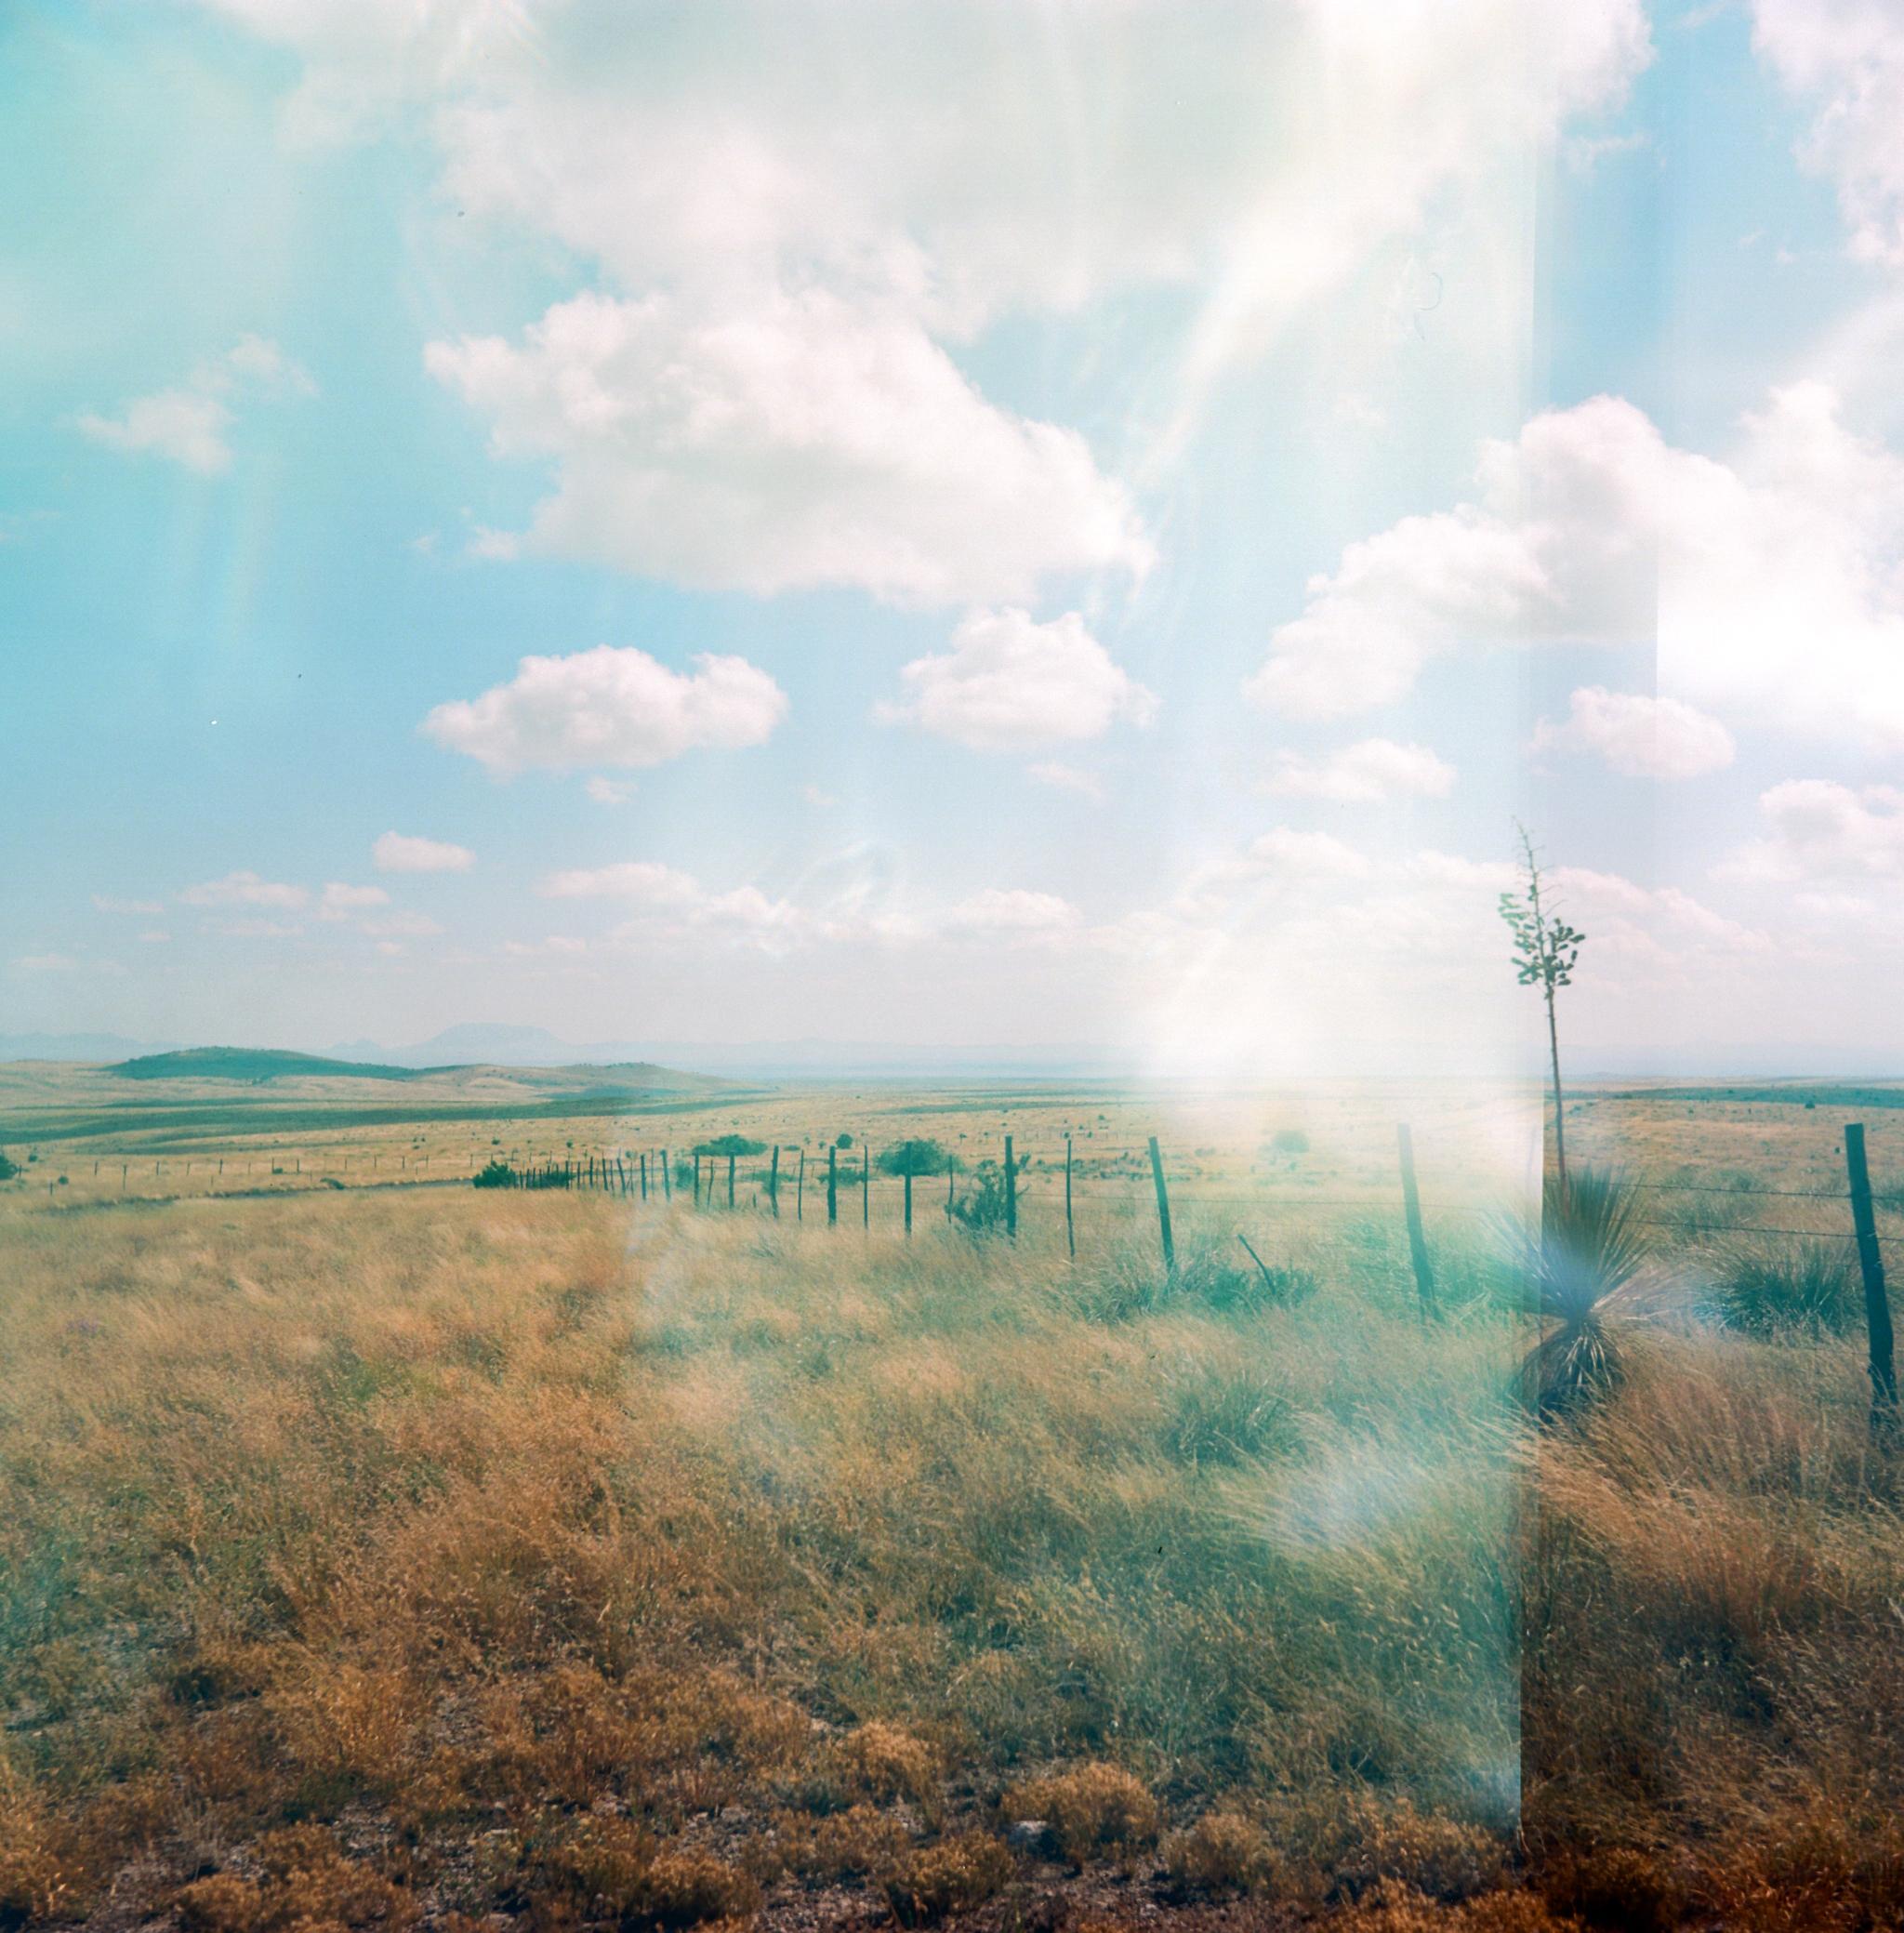 Marfa Texas Photographer - Jessica Garmon